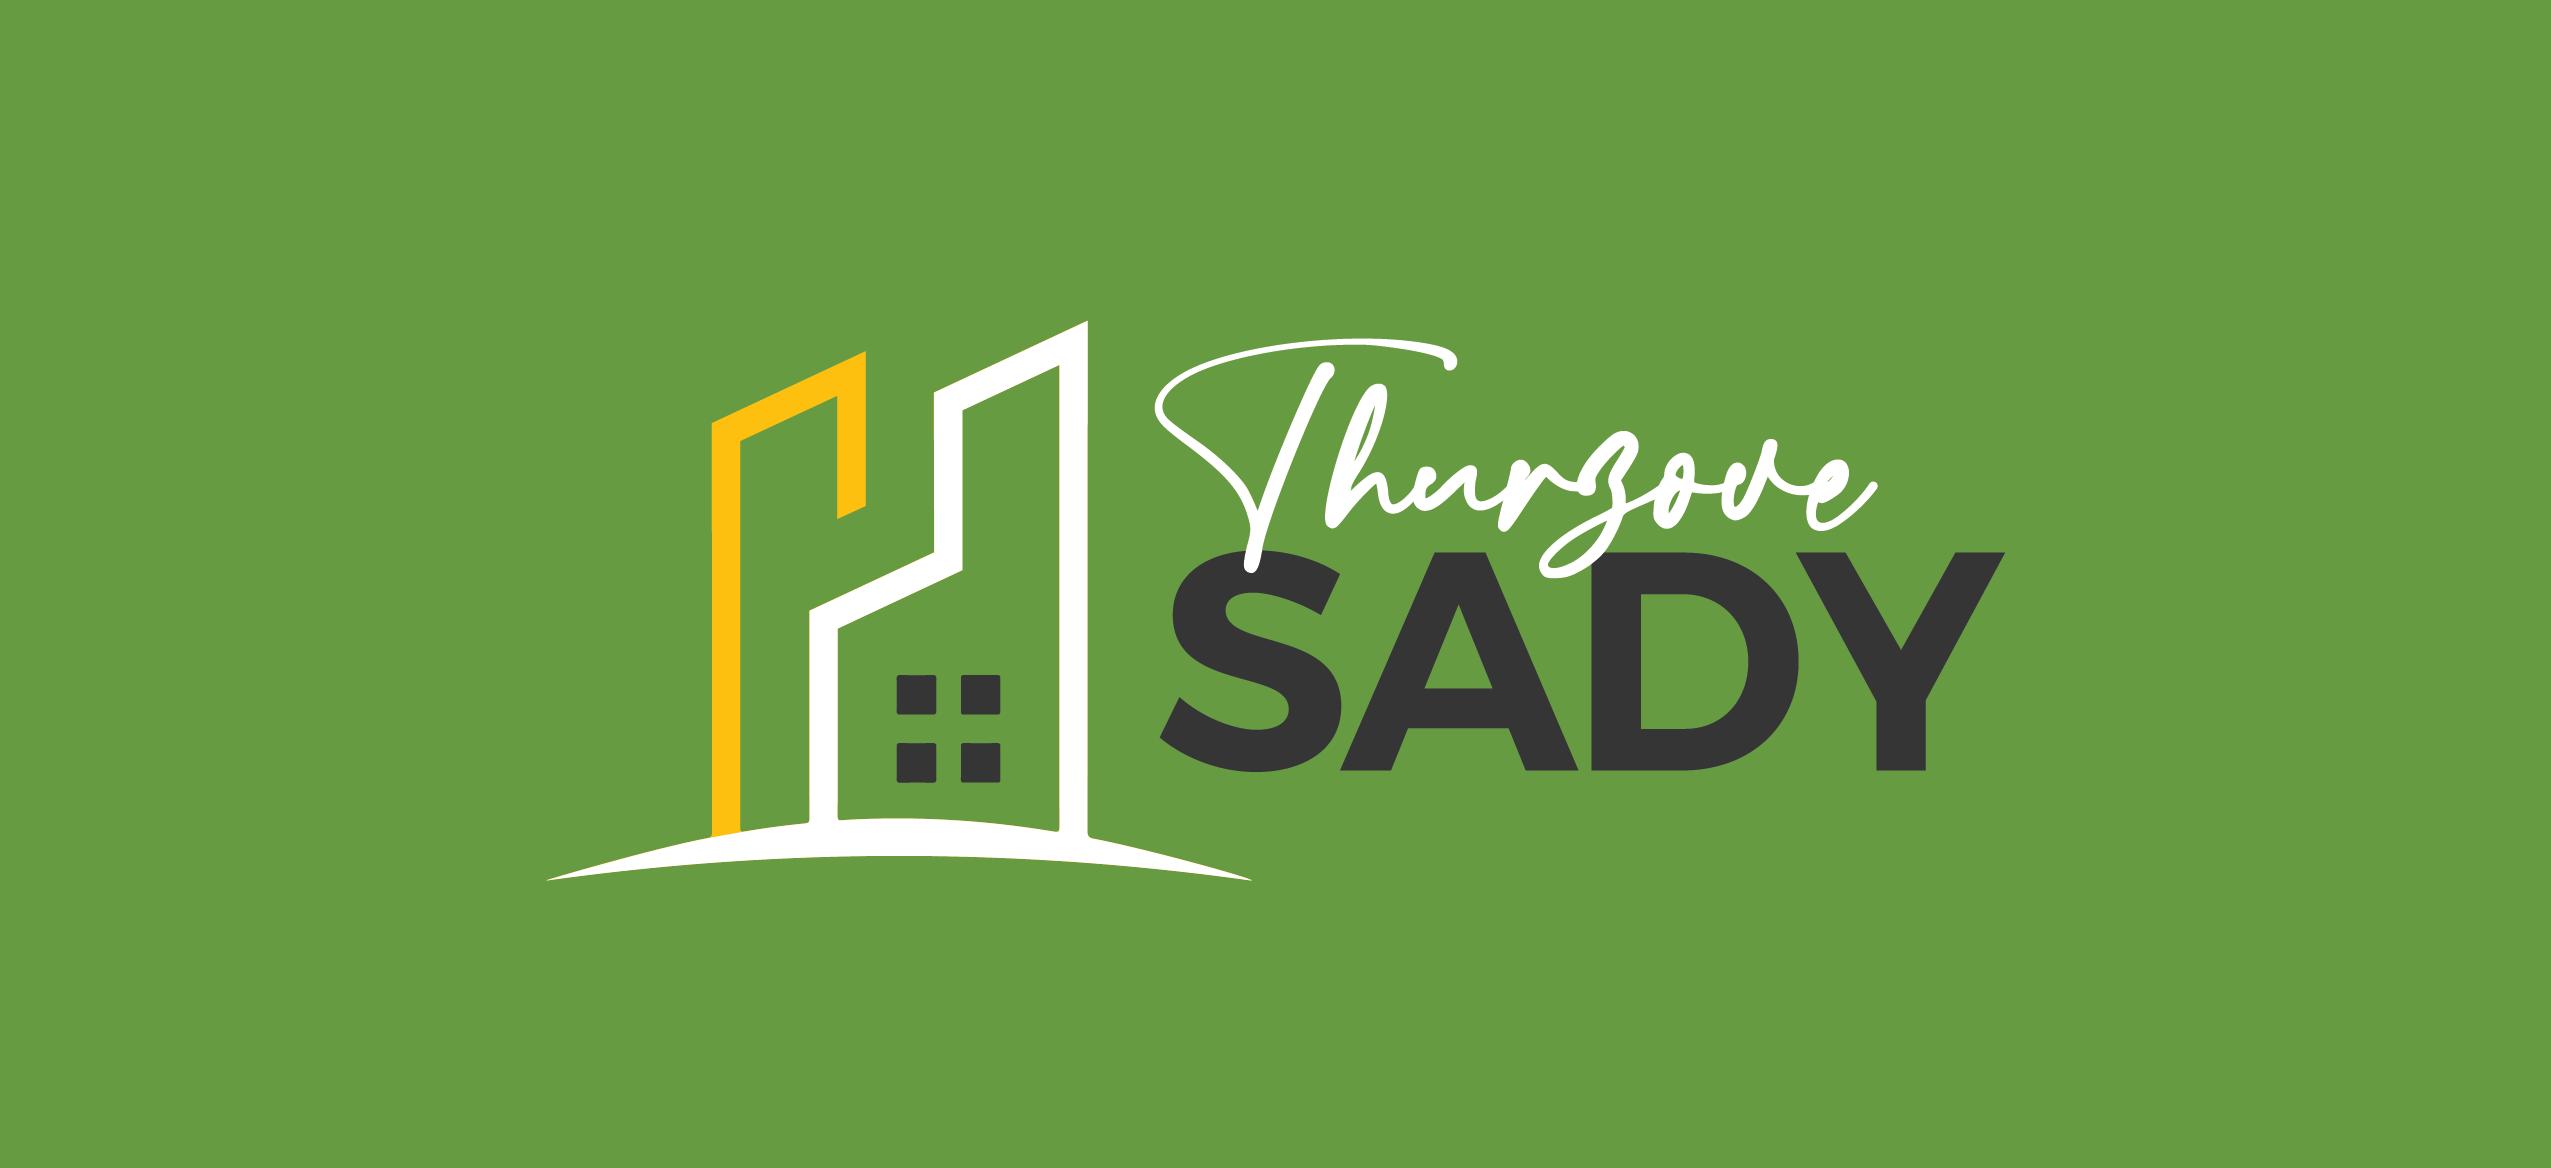 Thurzove-sady-logo-green-01-01